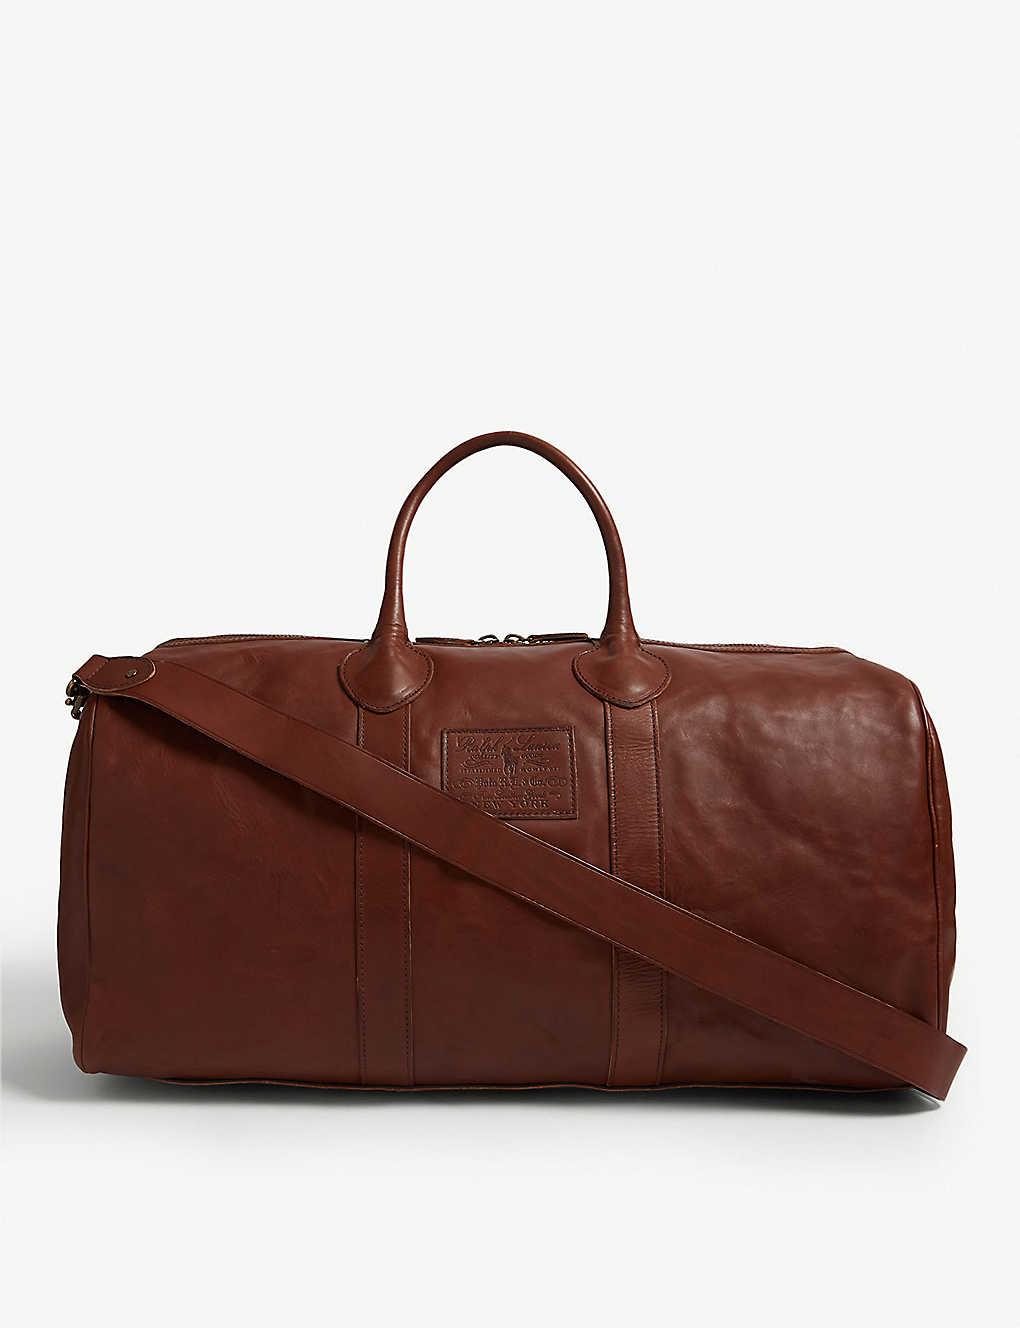 ba04feefd POLO RALPH LAUREN - Leather duffle bag